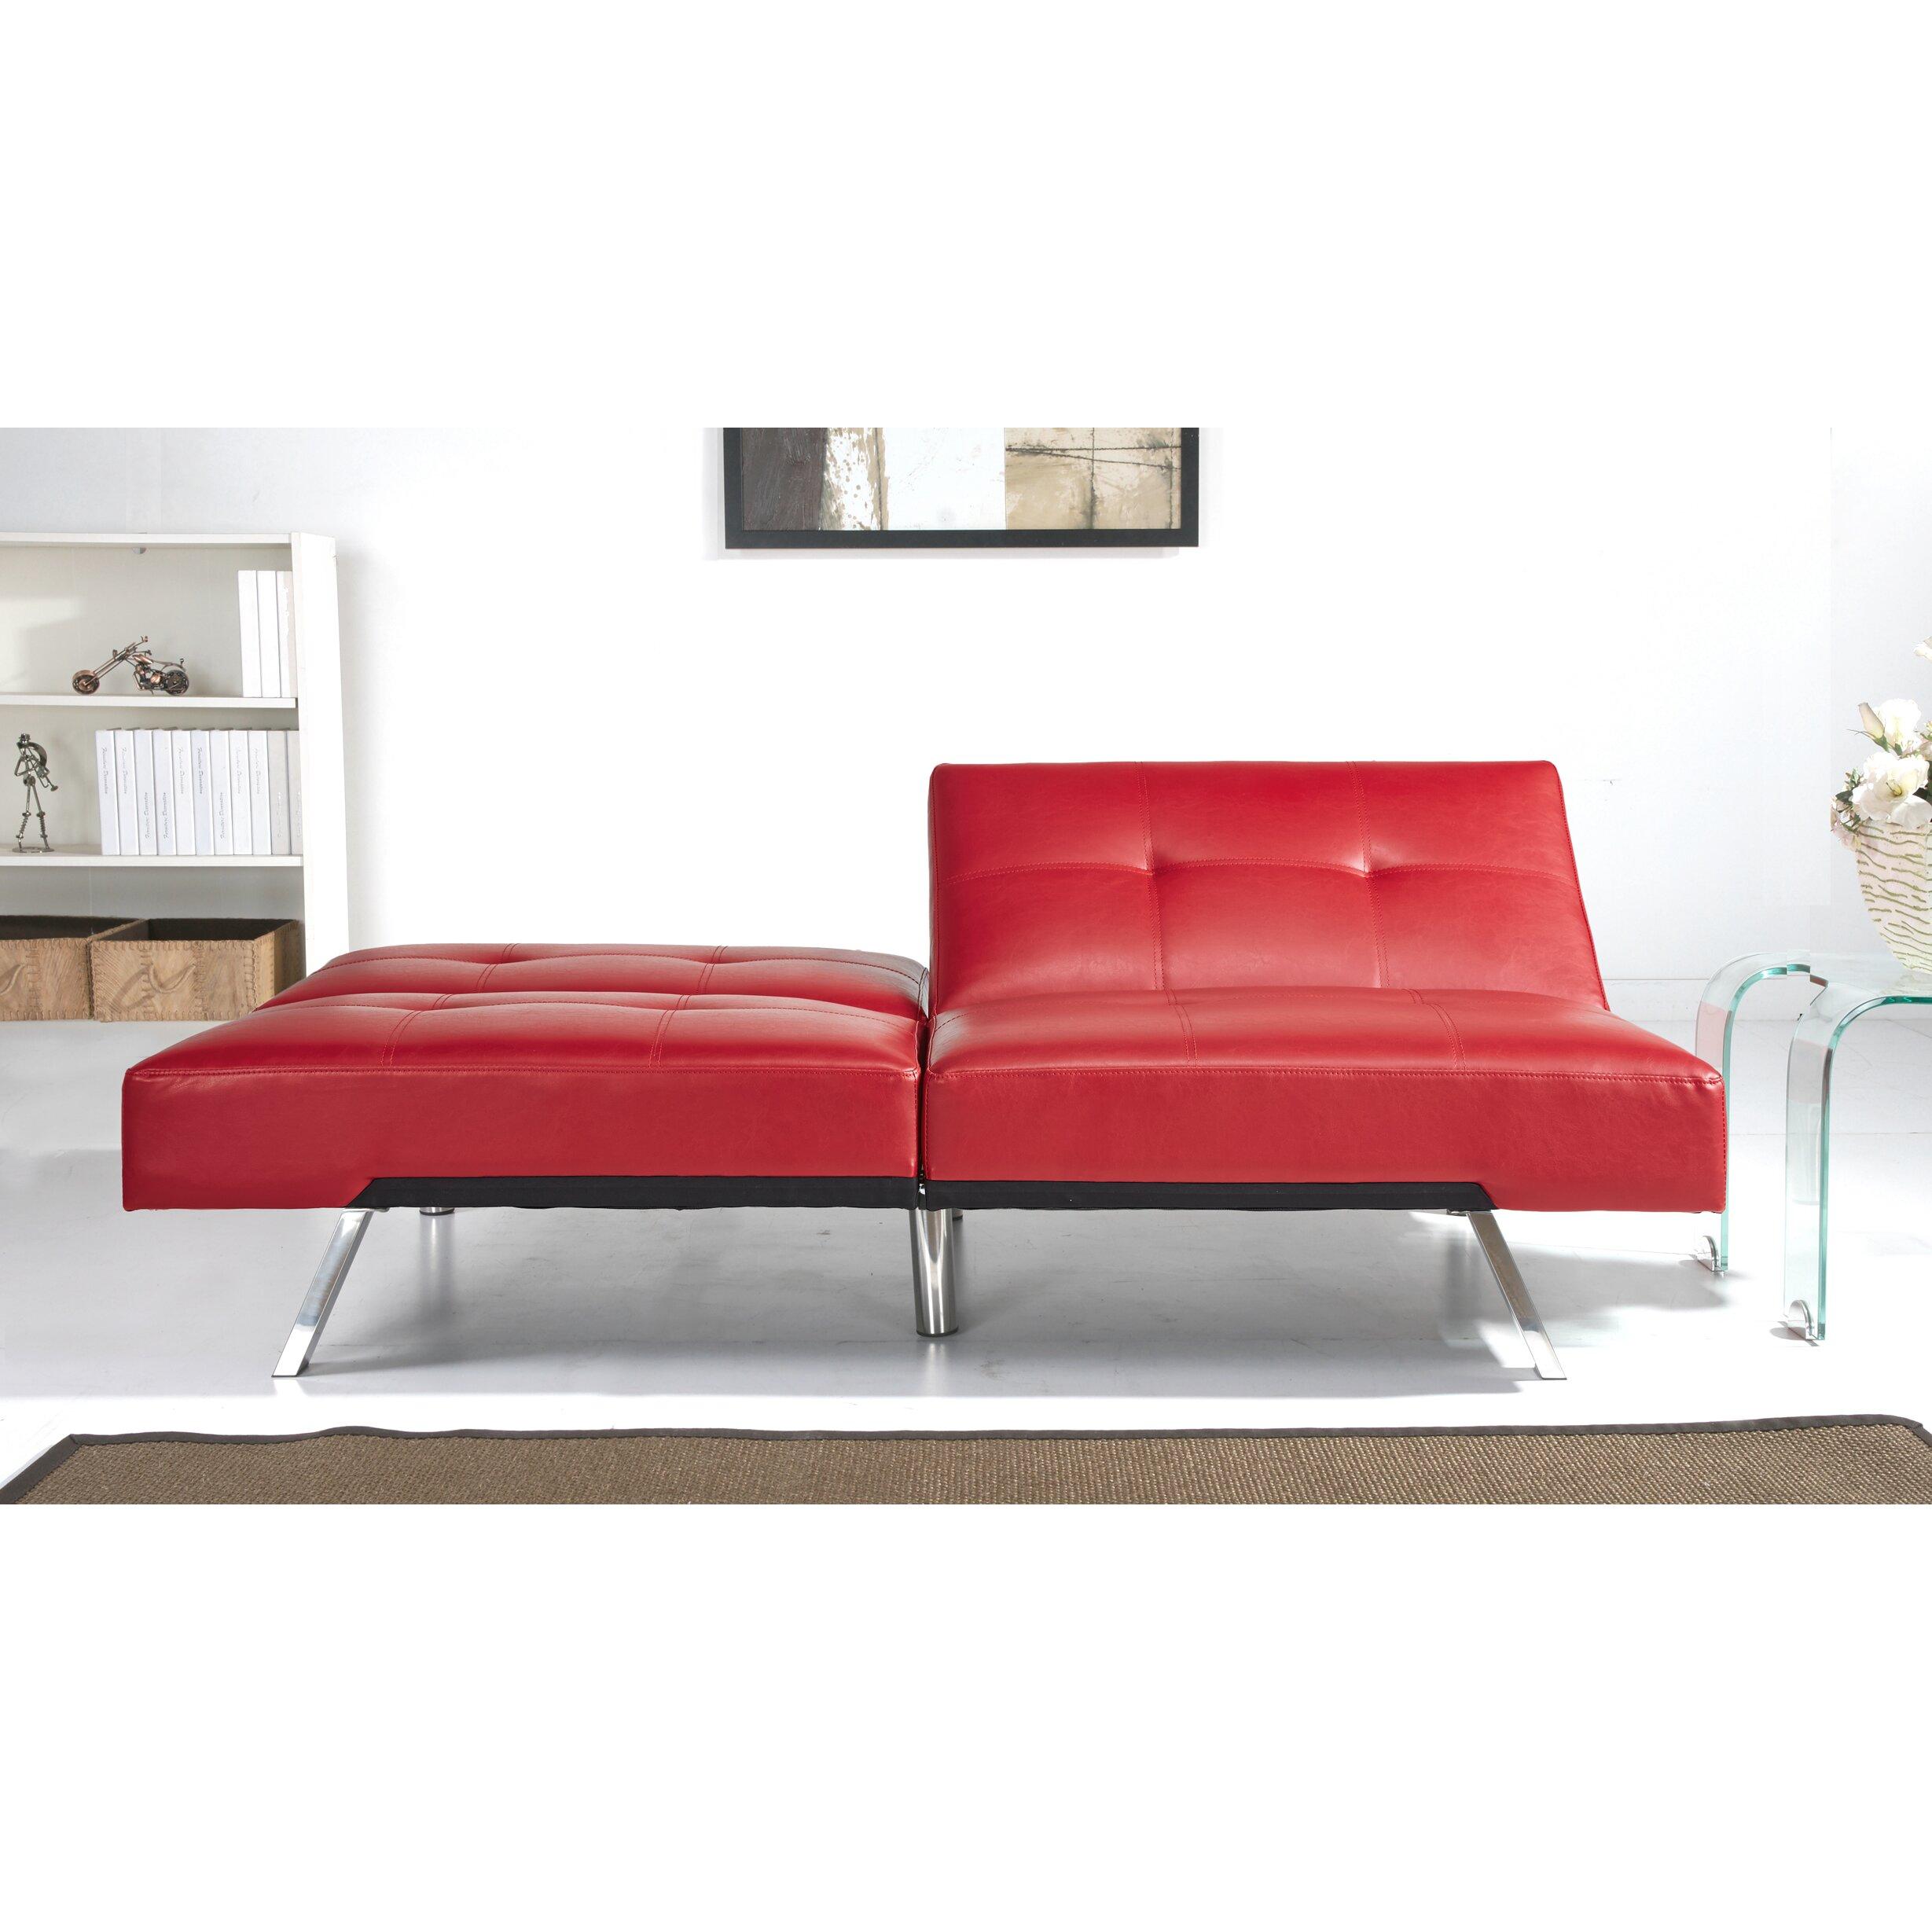 Ian Sofa Room And Board Review – Mjob Blog